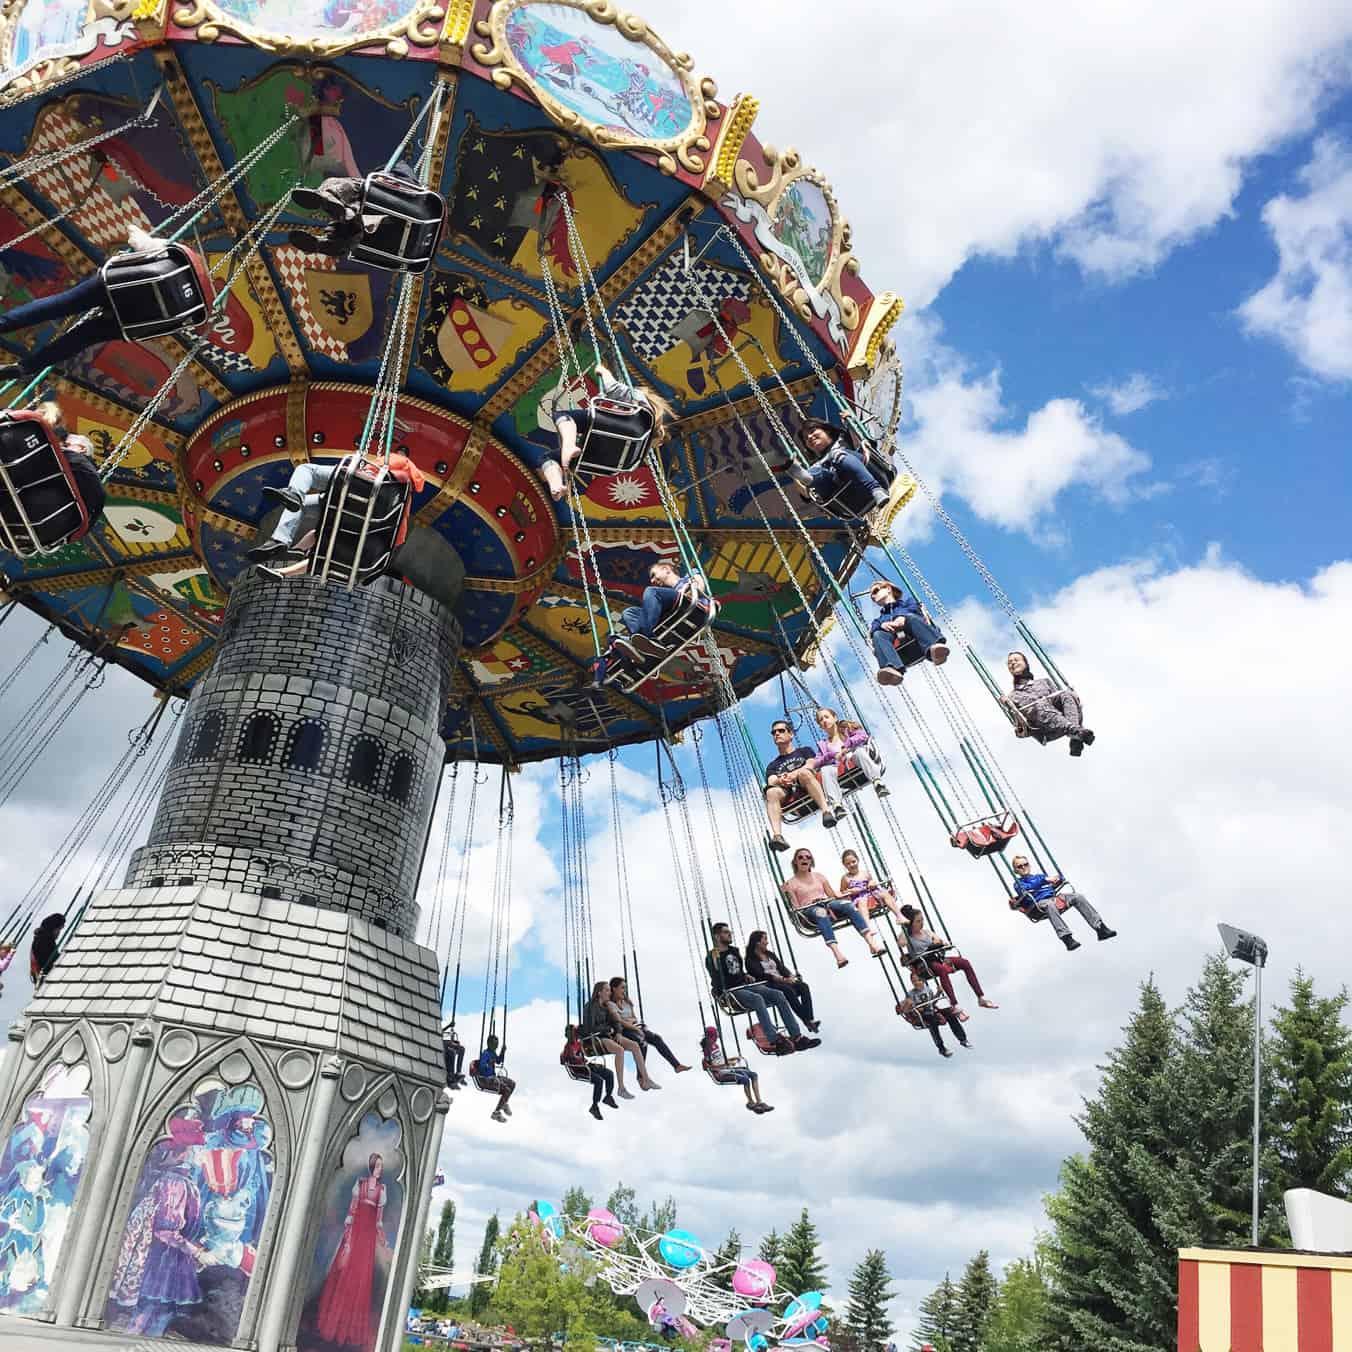 The Dream Machine Swings, Calaway Park